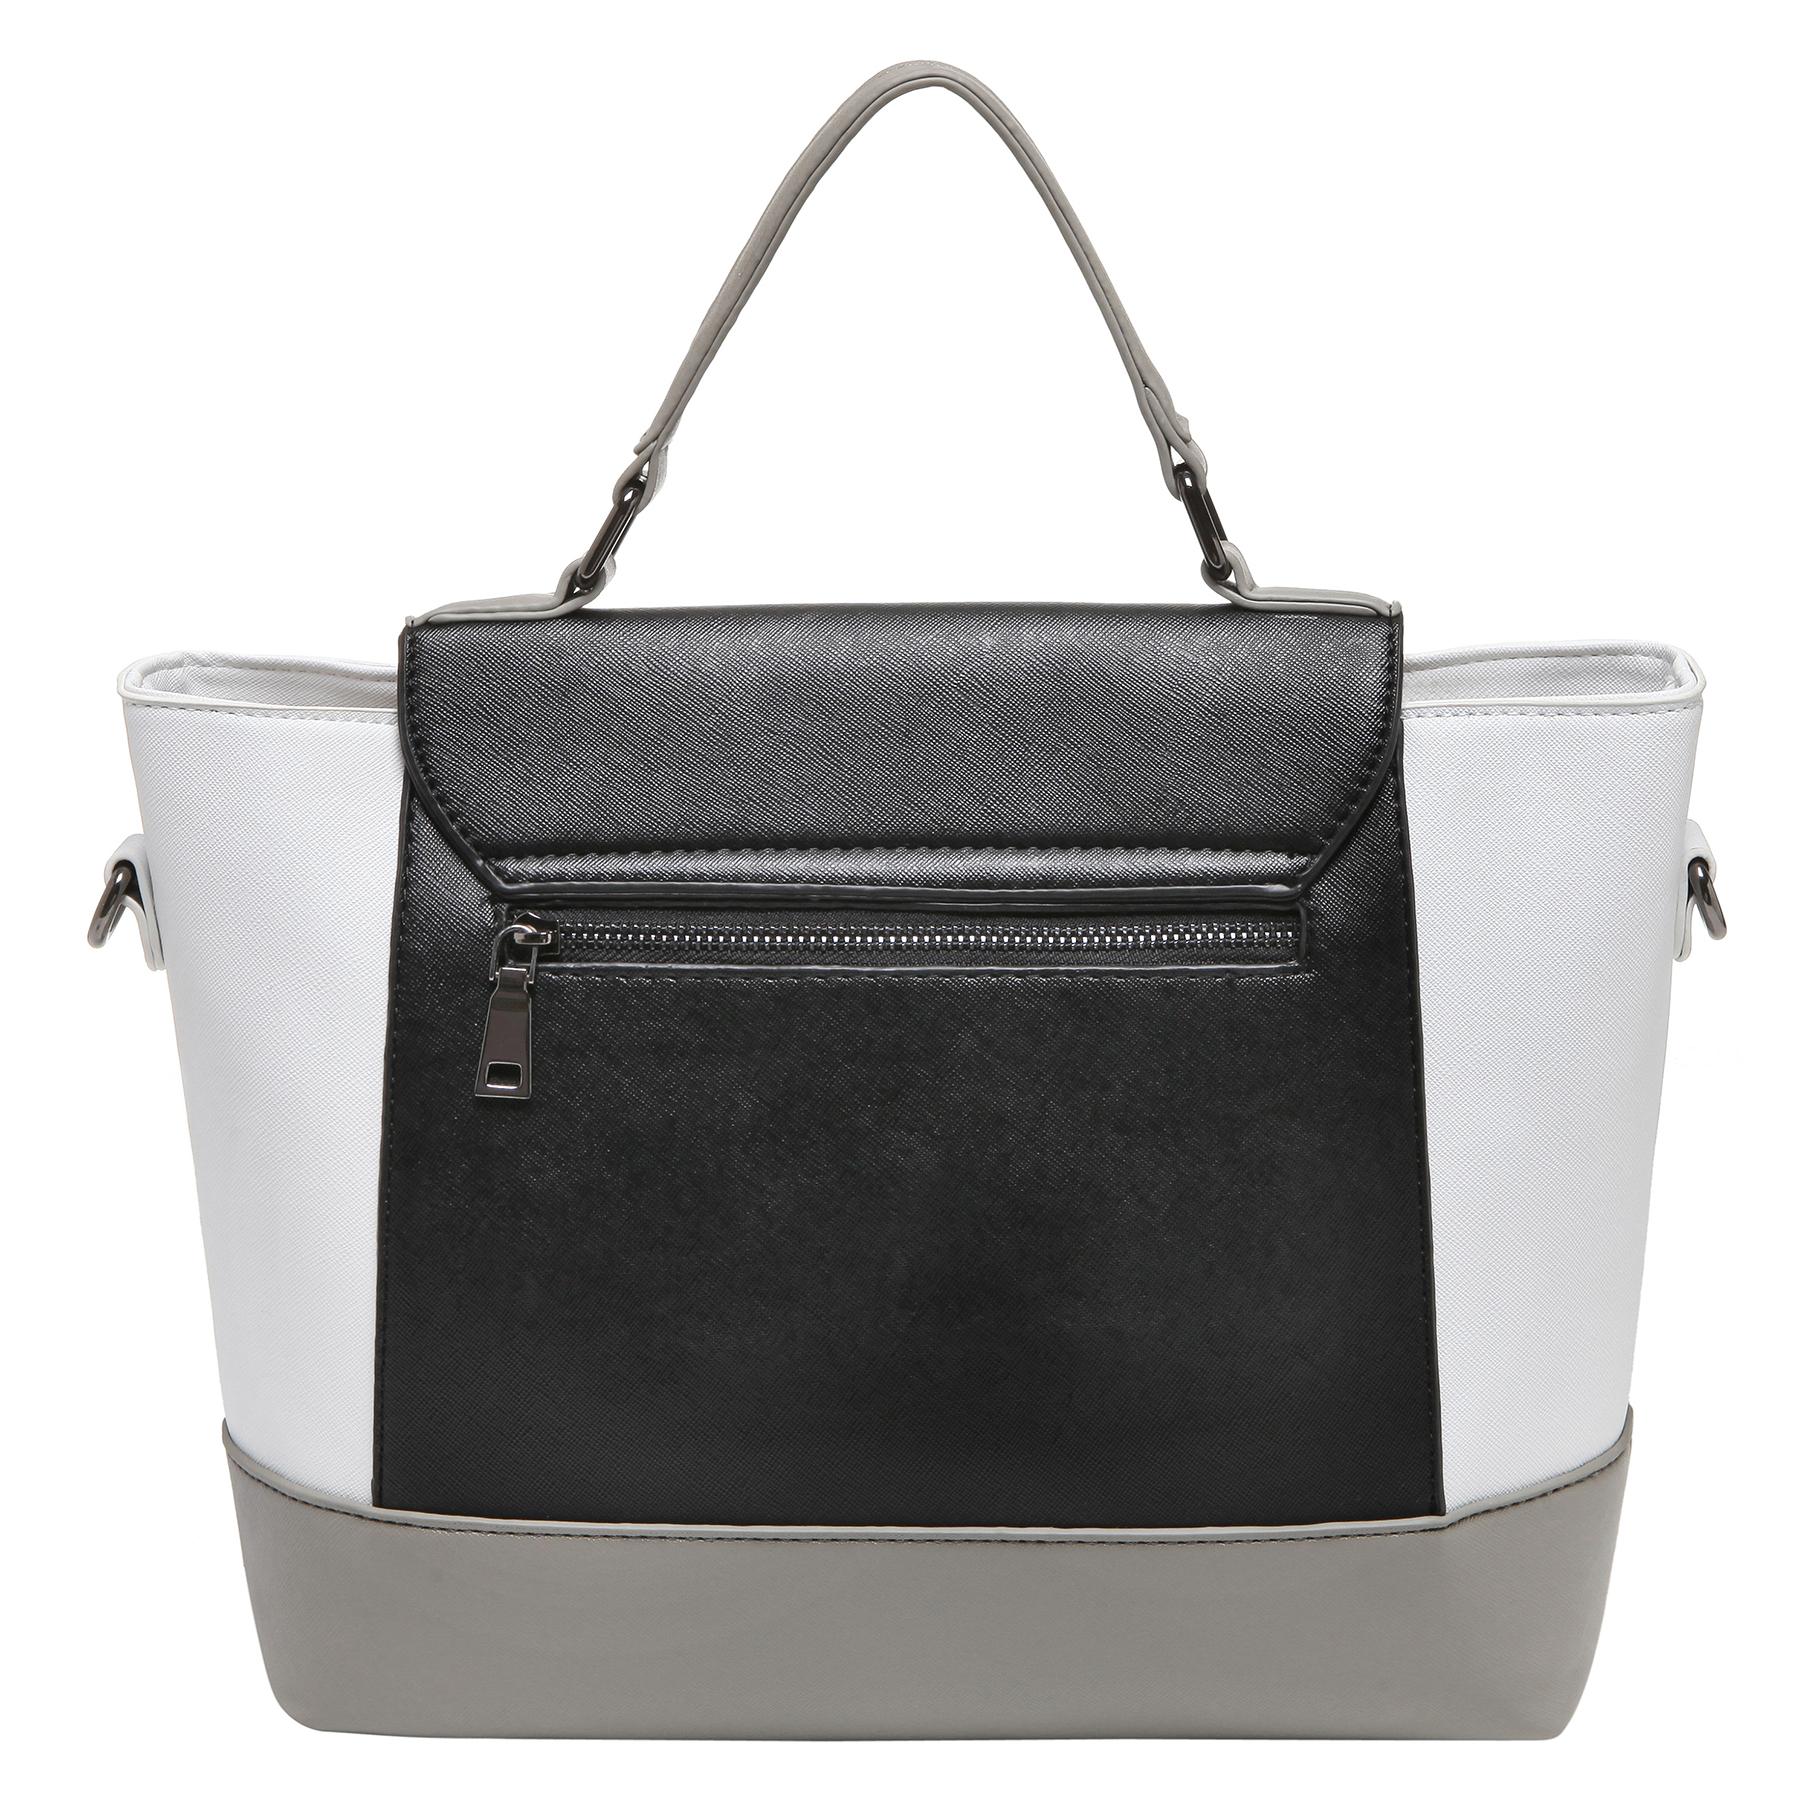 mg-collection-meryl-top-handle-tote-handbag-tb-h0651blk-5.jpg